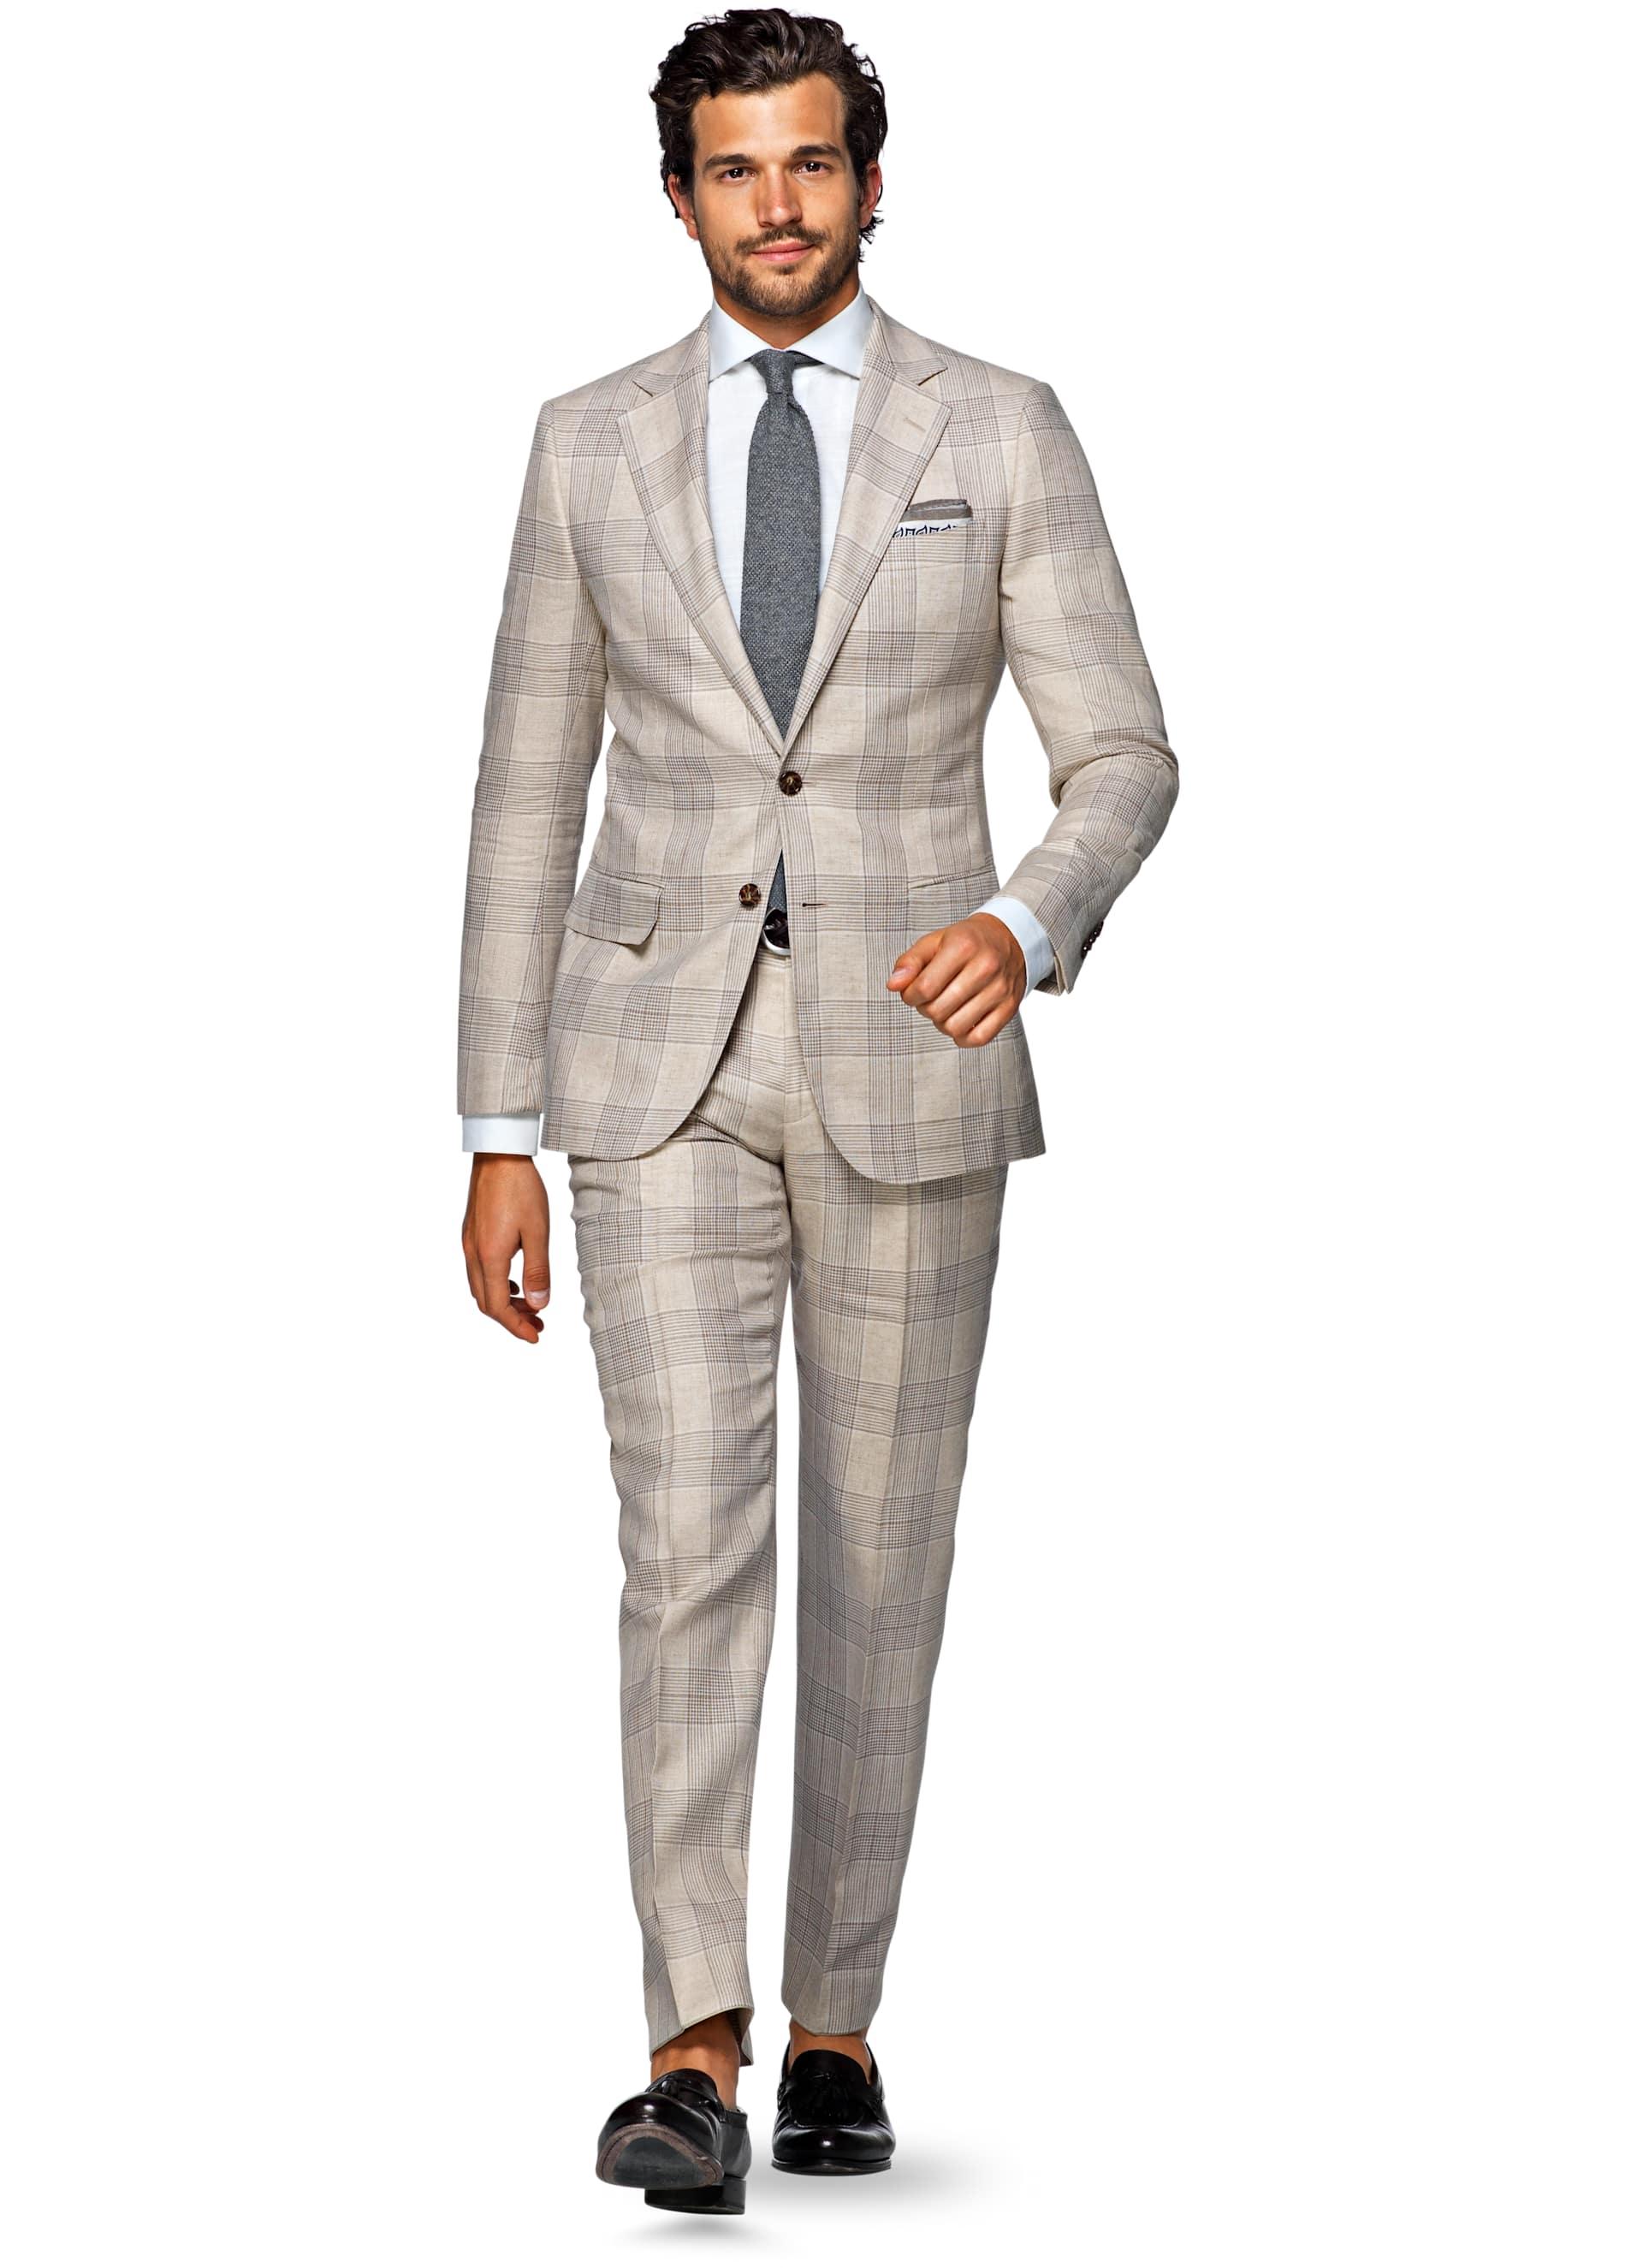 Suit Light Brown Check Lazio P4822i | Suitsupply Online Store